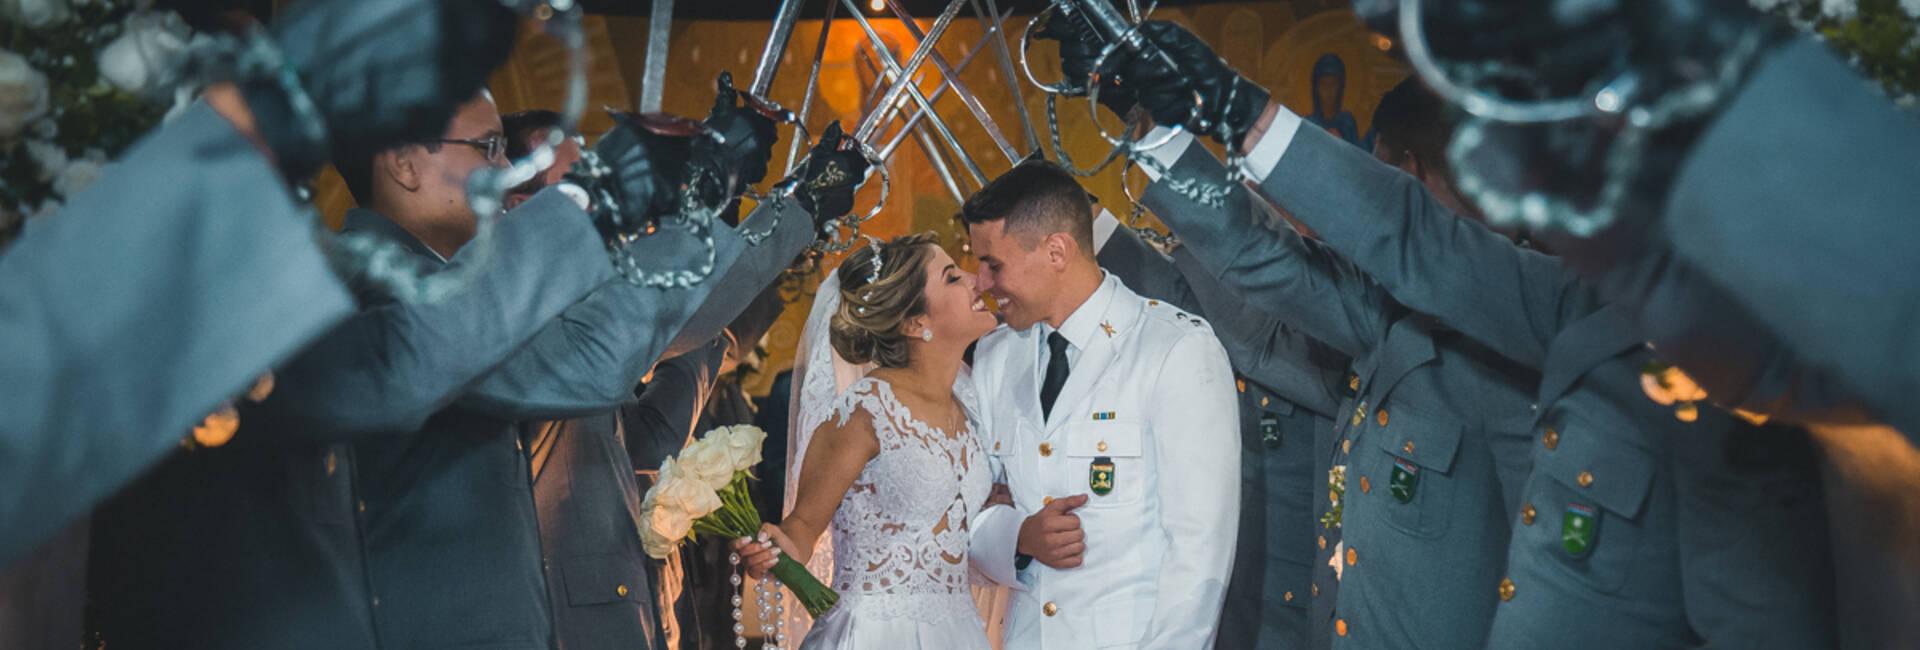 Casamento de Nayara & Andre